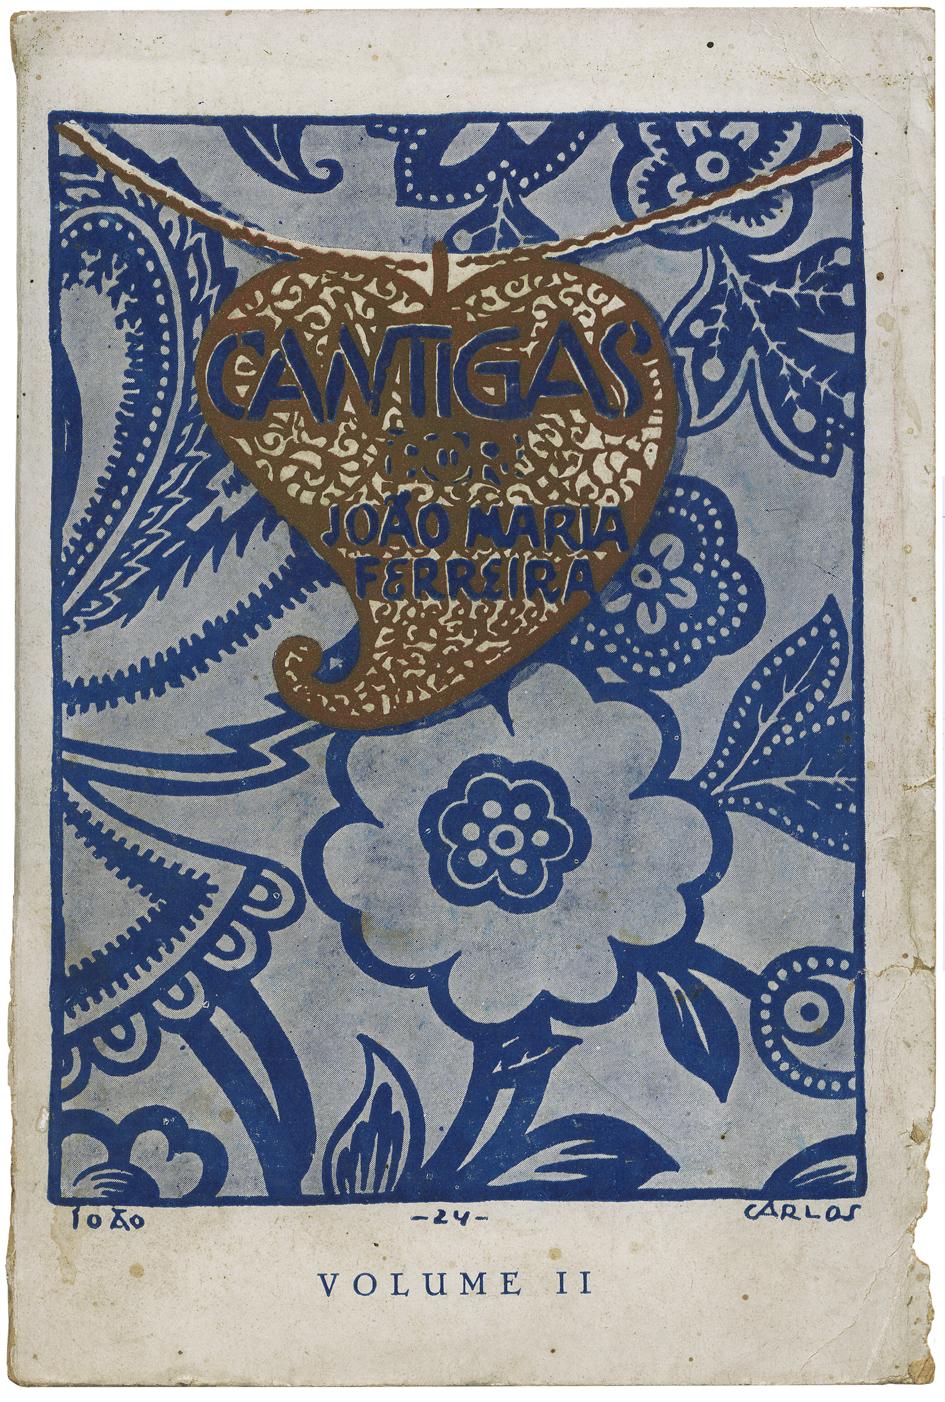 cantigas 1924.jpg